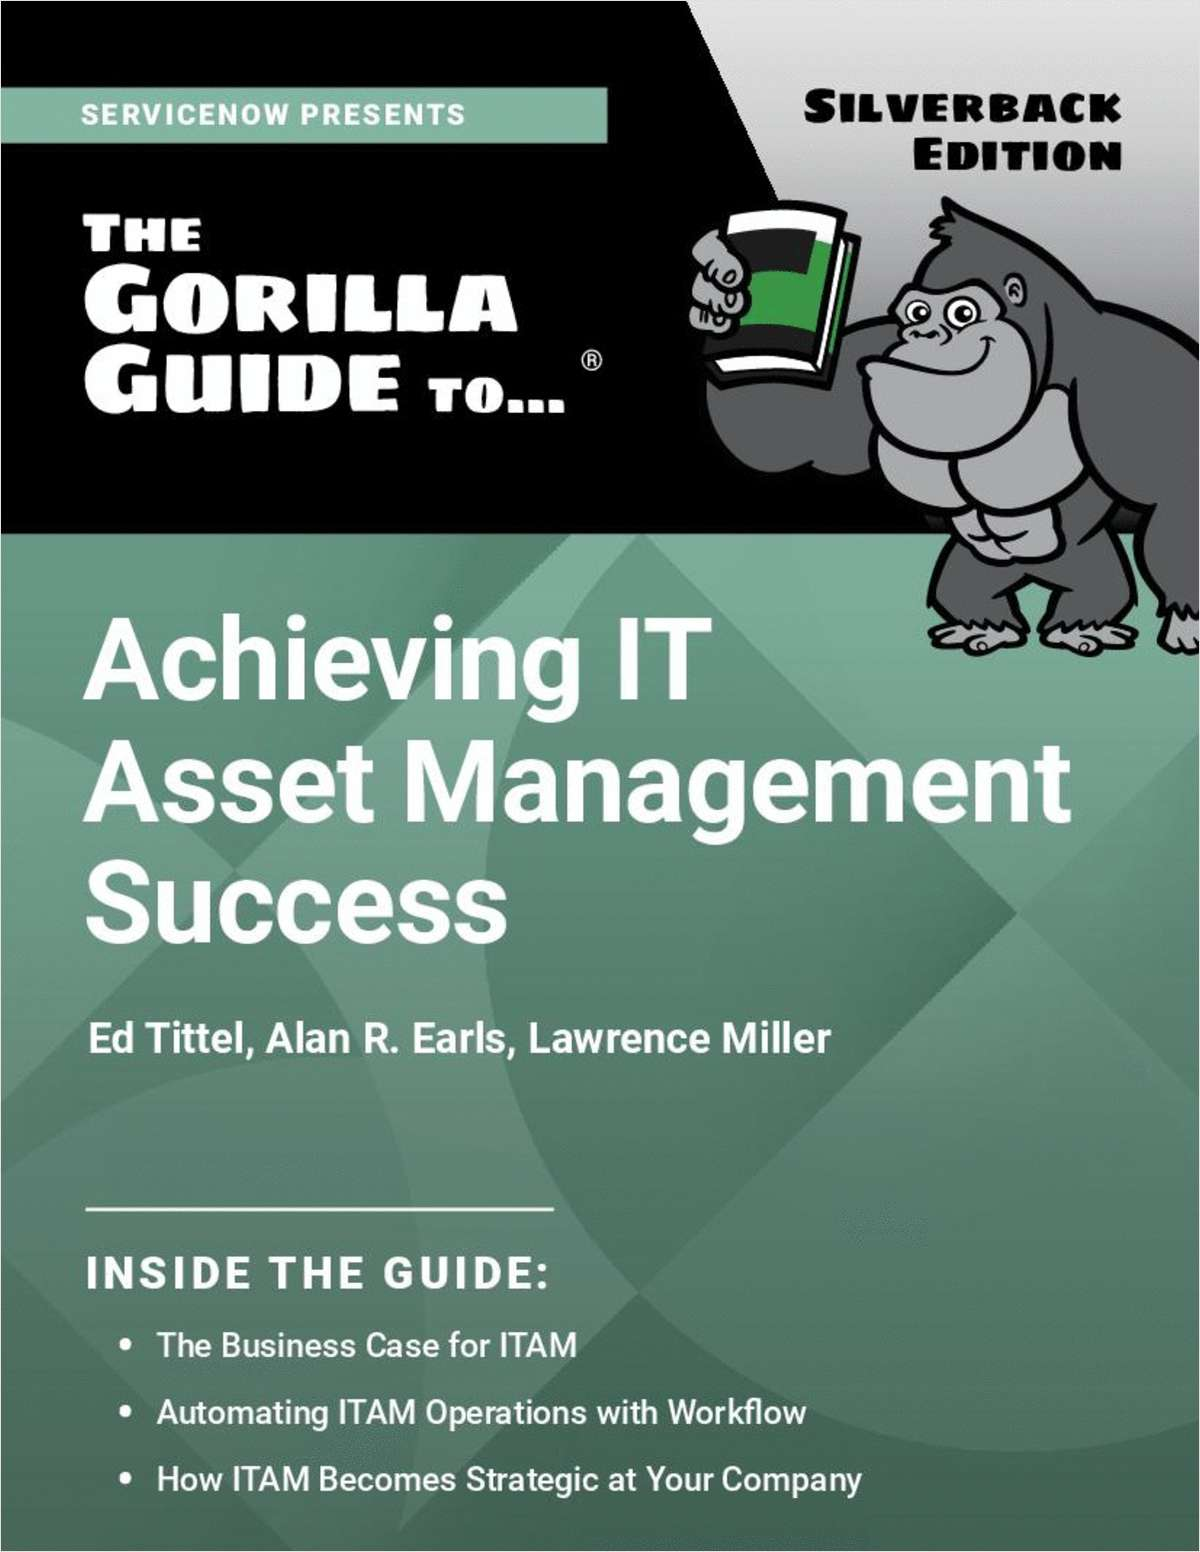 The Gorilla Guide to Achieving IT Asset Management Success